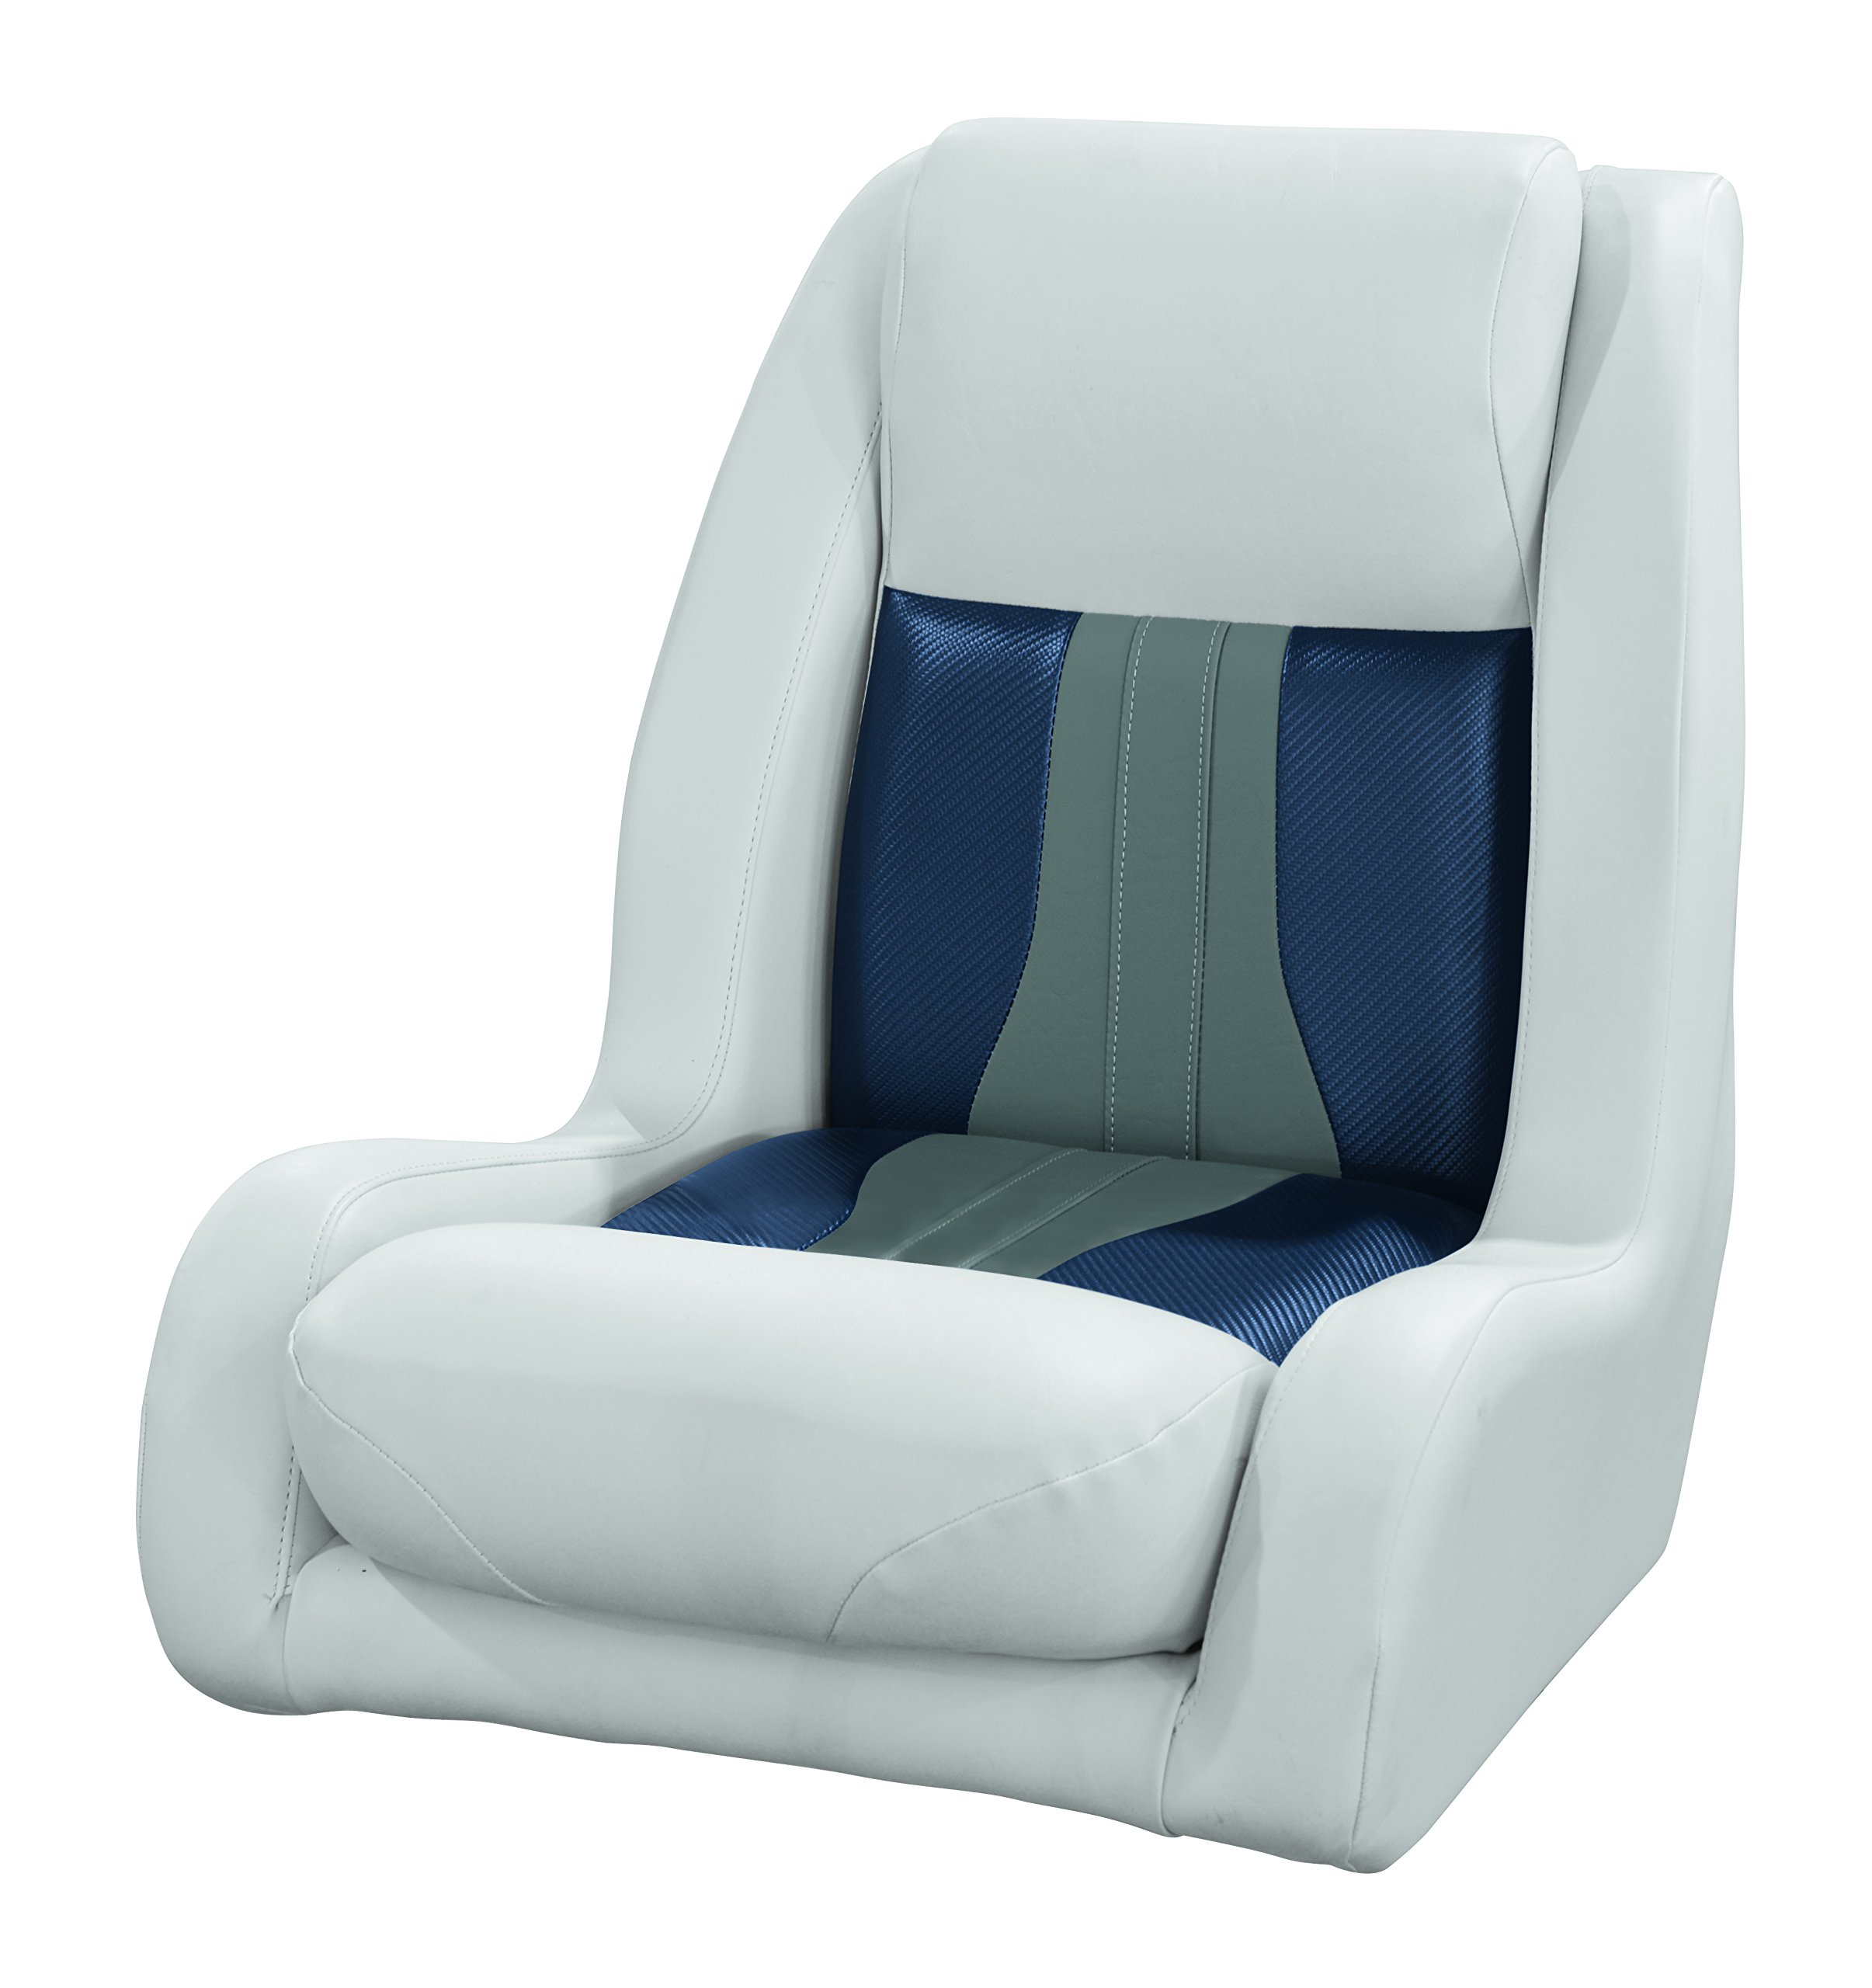 Wise 3013-1801 Talon Pontoon Series High Back Bucket Helm Seat, Sky Grey/Dove Grey/Laguna Blue Carbon Fiber by Wise